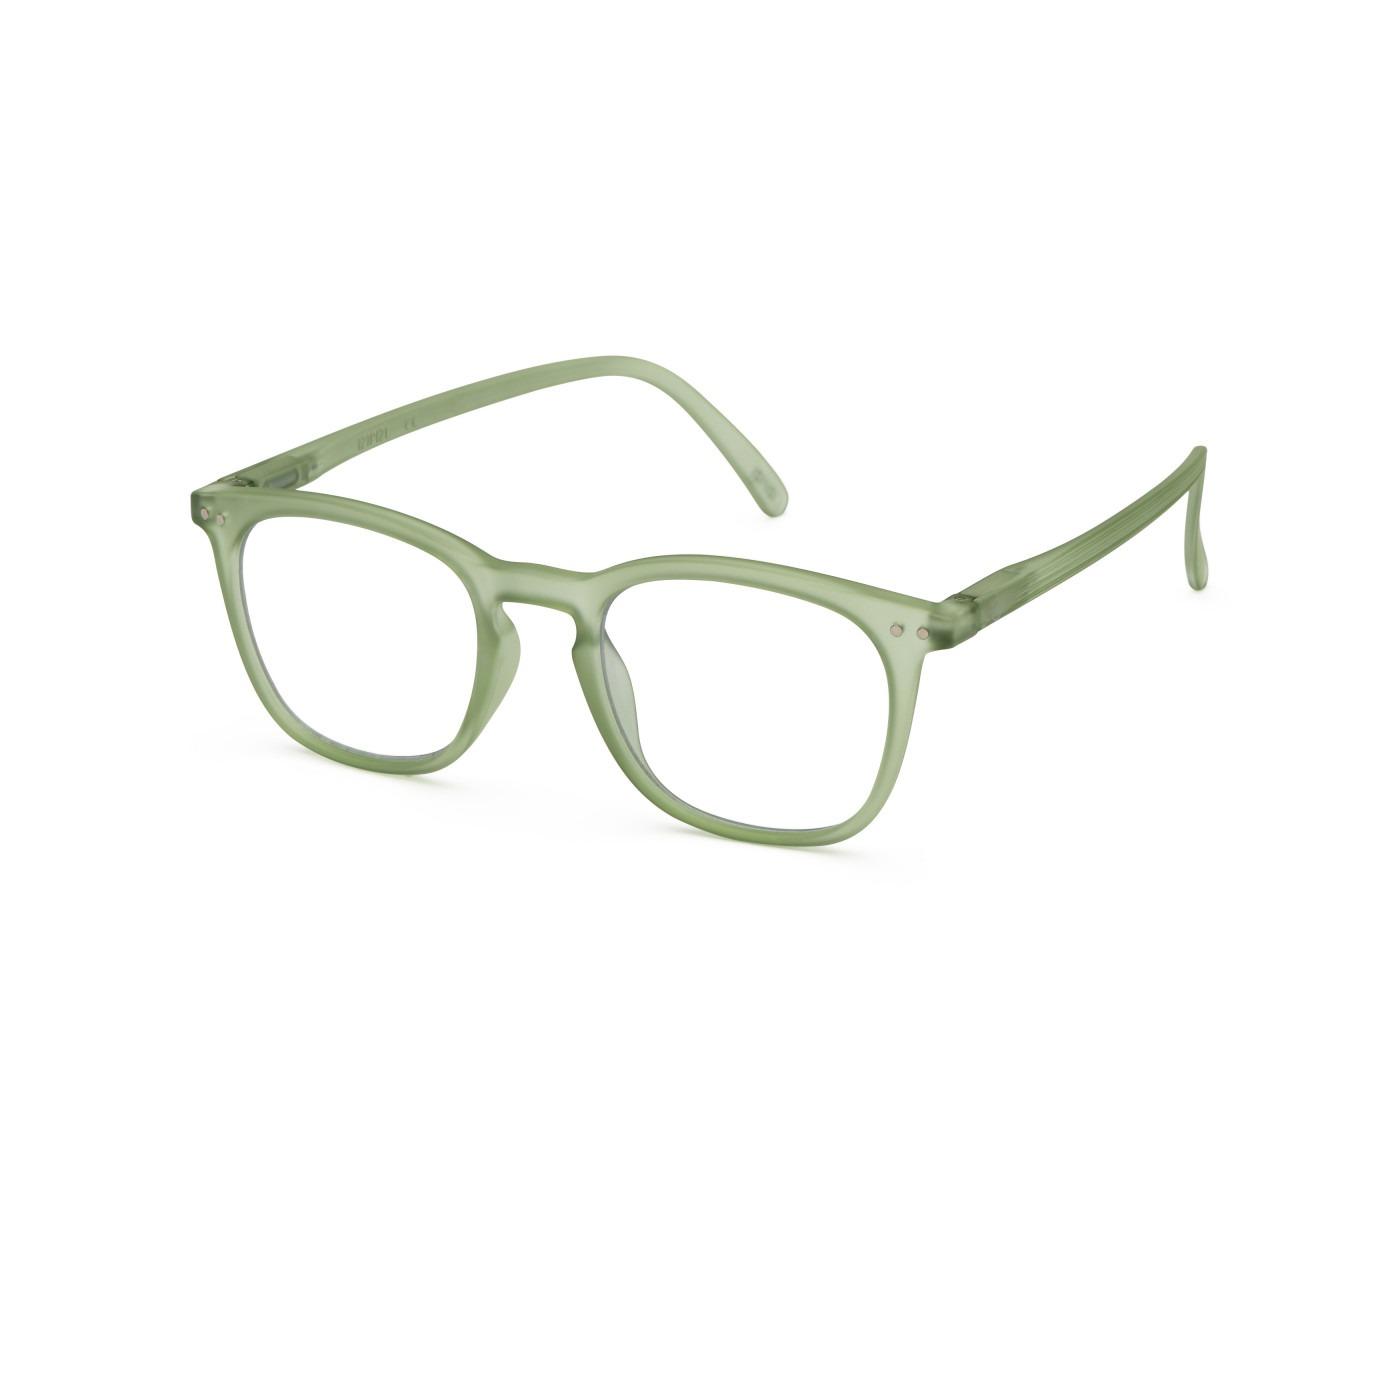 Izipizi #E Screen Protection Glasses in Peppermint